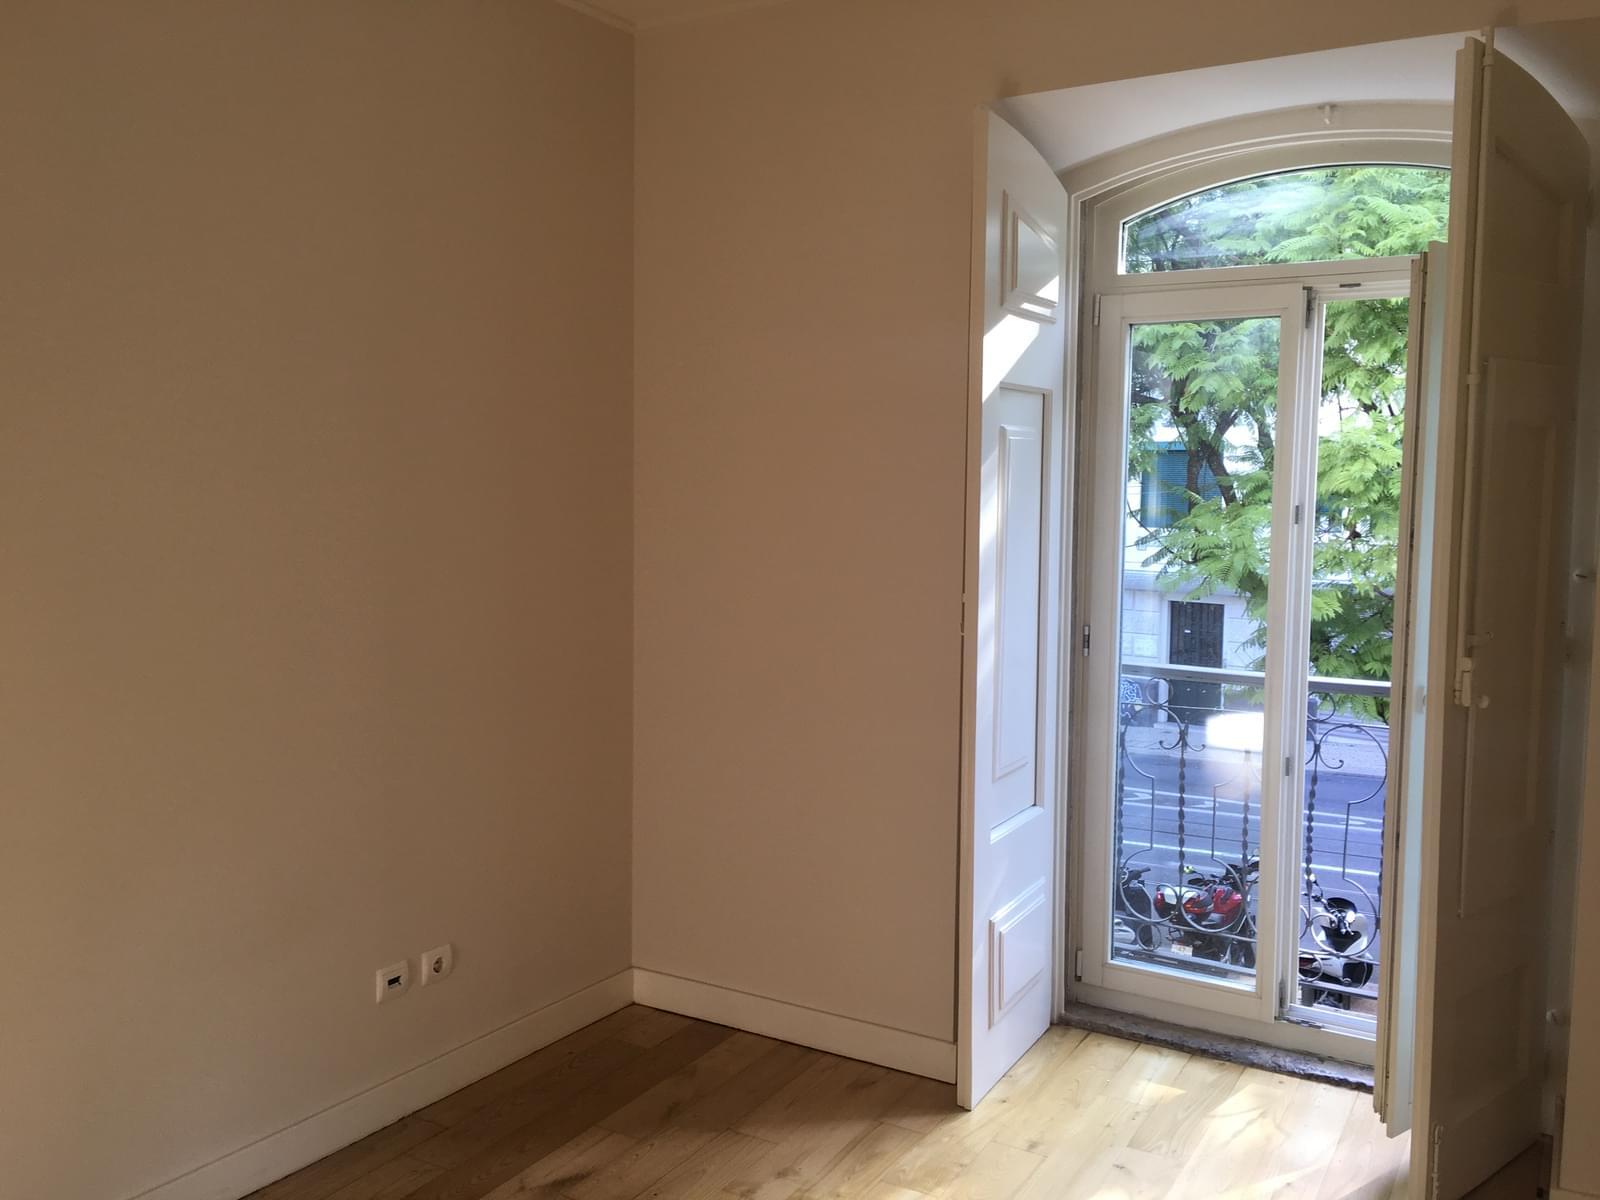 pf18822-apartamento-t1-lisboa-4299fa5f-2270-40b6-a1a7-b16b424c8e71